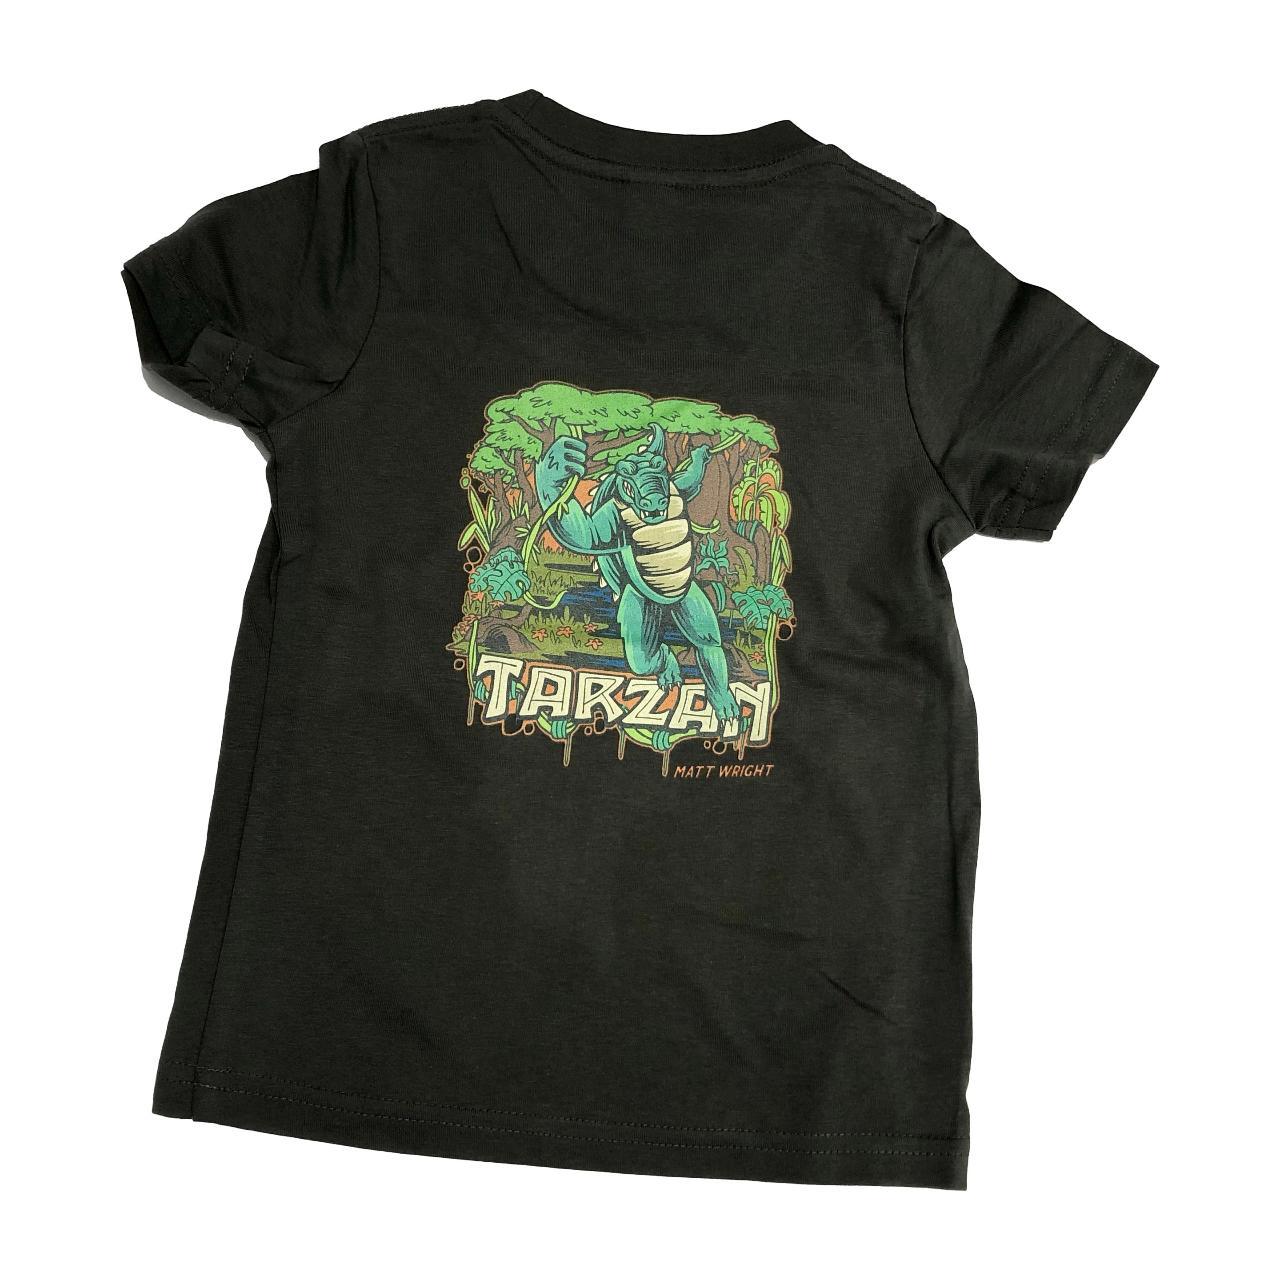 Tarzan Kids and Youth Tee Unisex